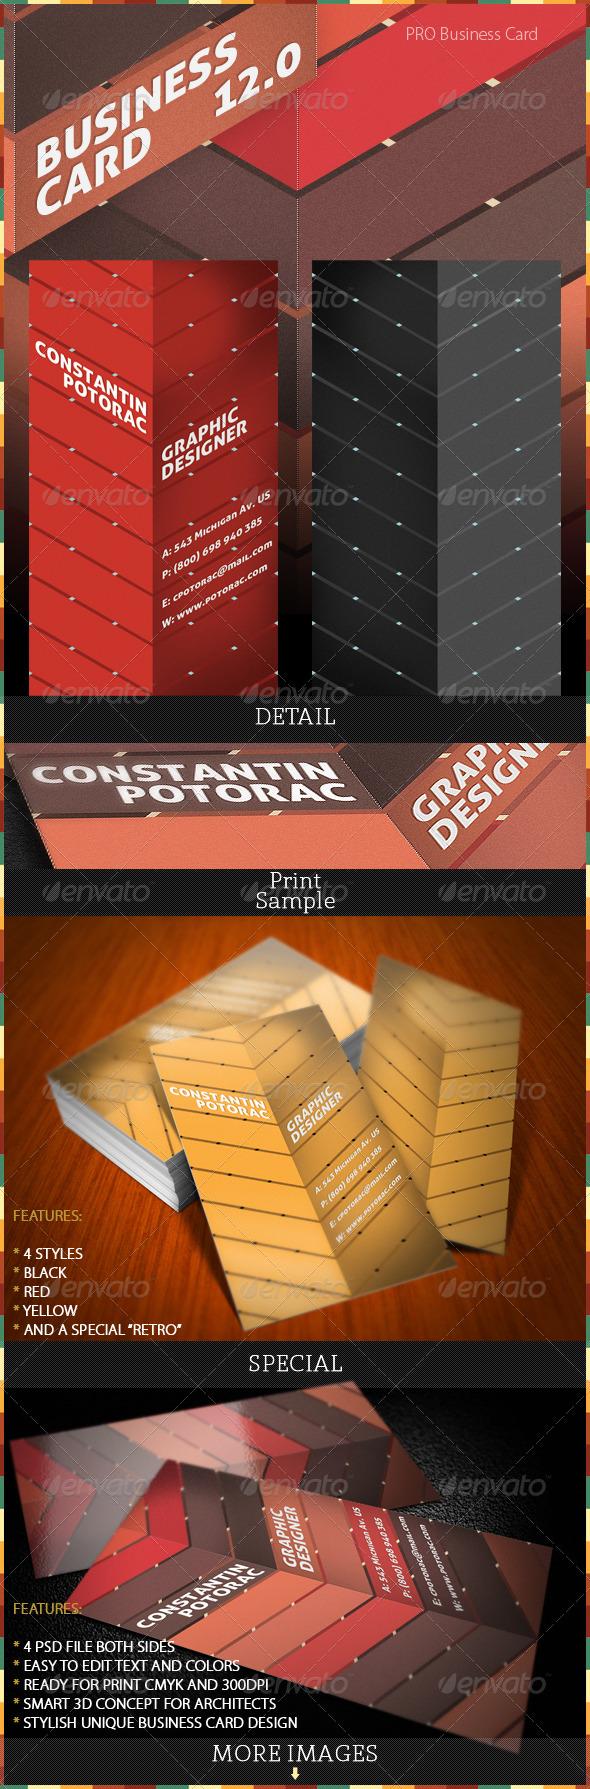 Pro Business Card 12.0 - Retro/Vintage Business Cards